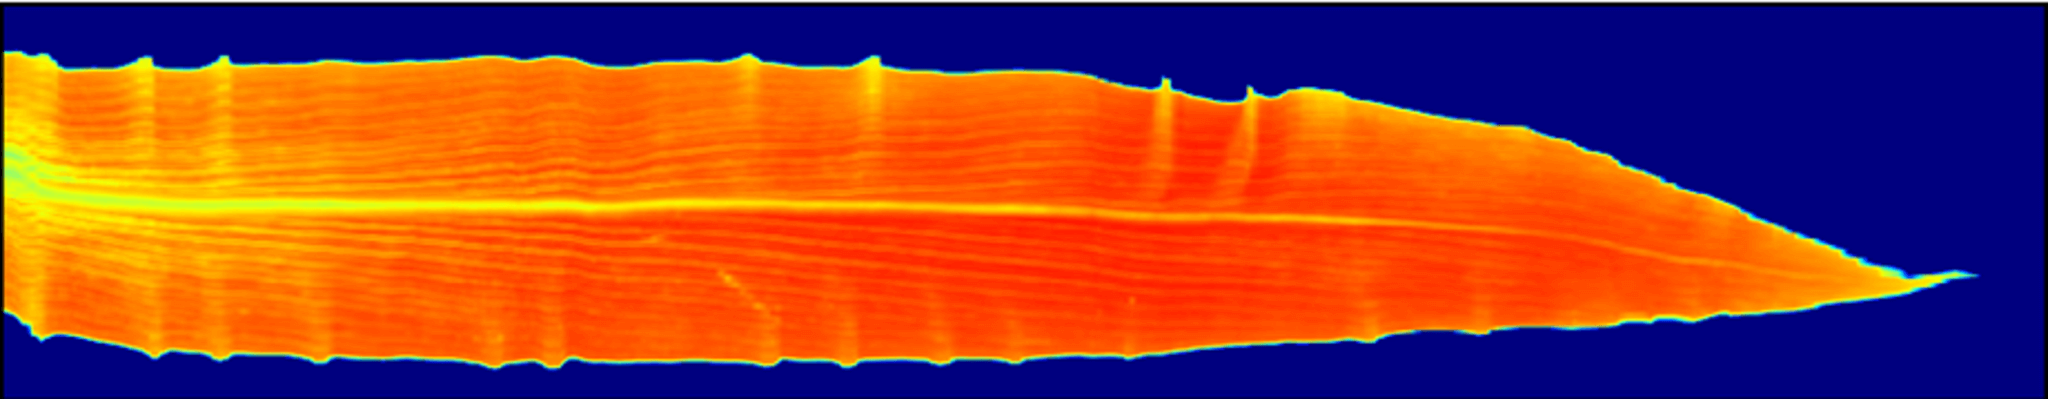 NDVI Heat Map of Corn Leaf